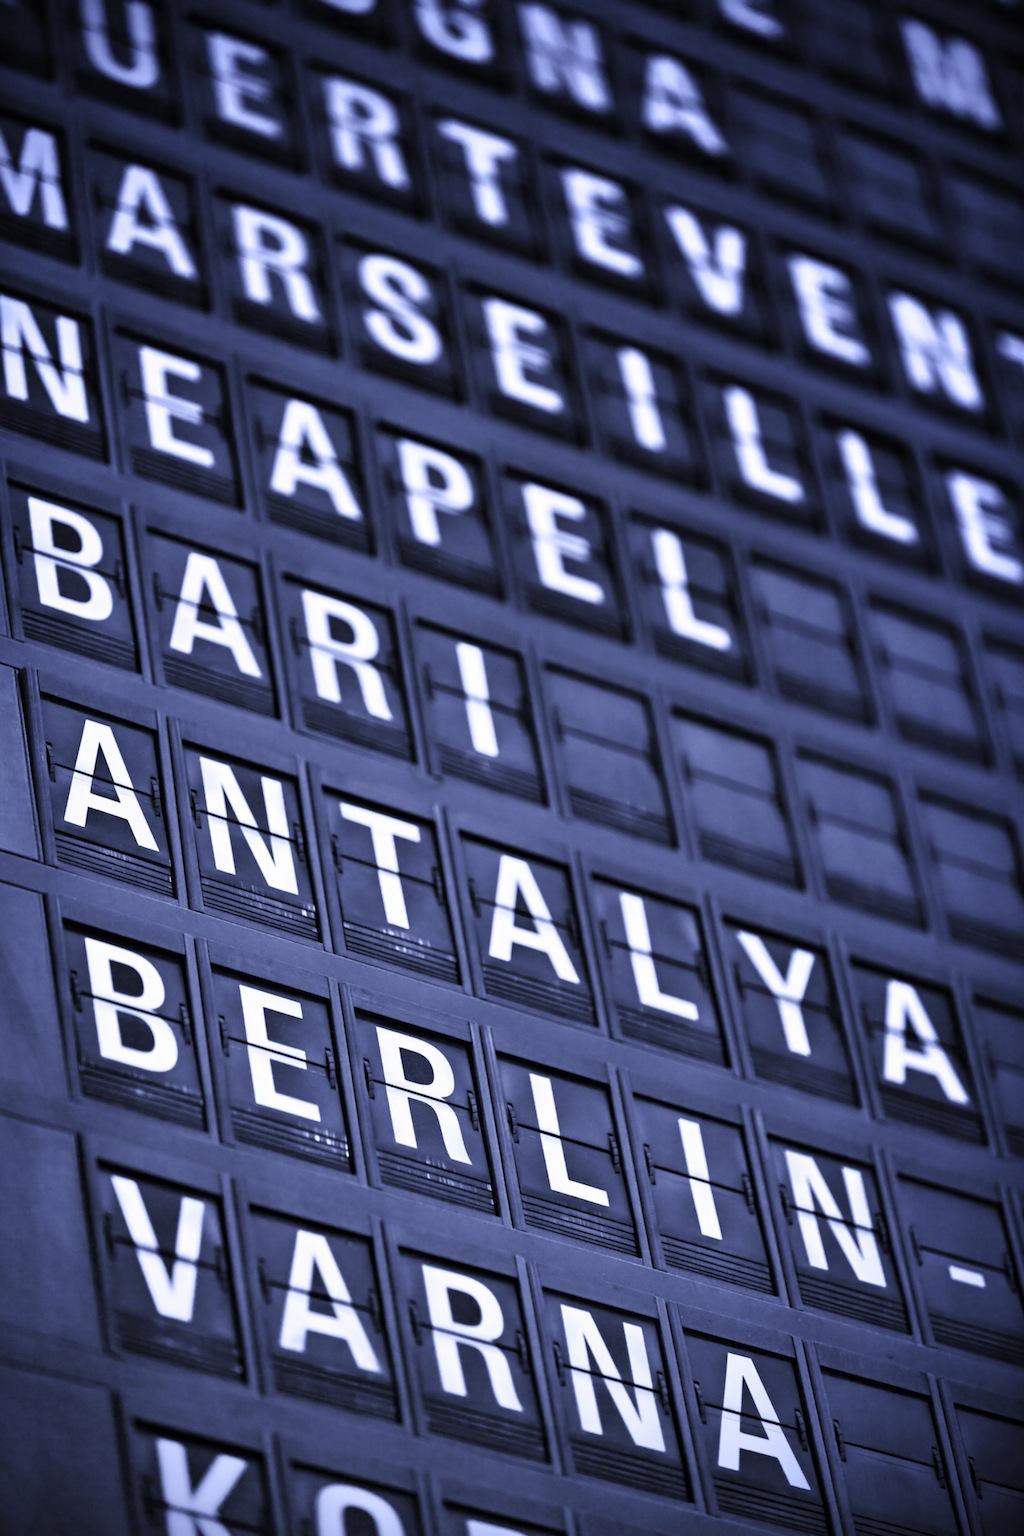 Arrivals/departures board